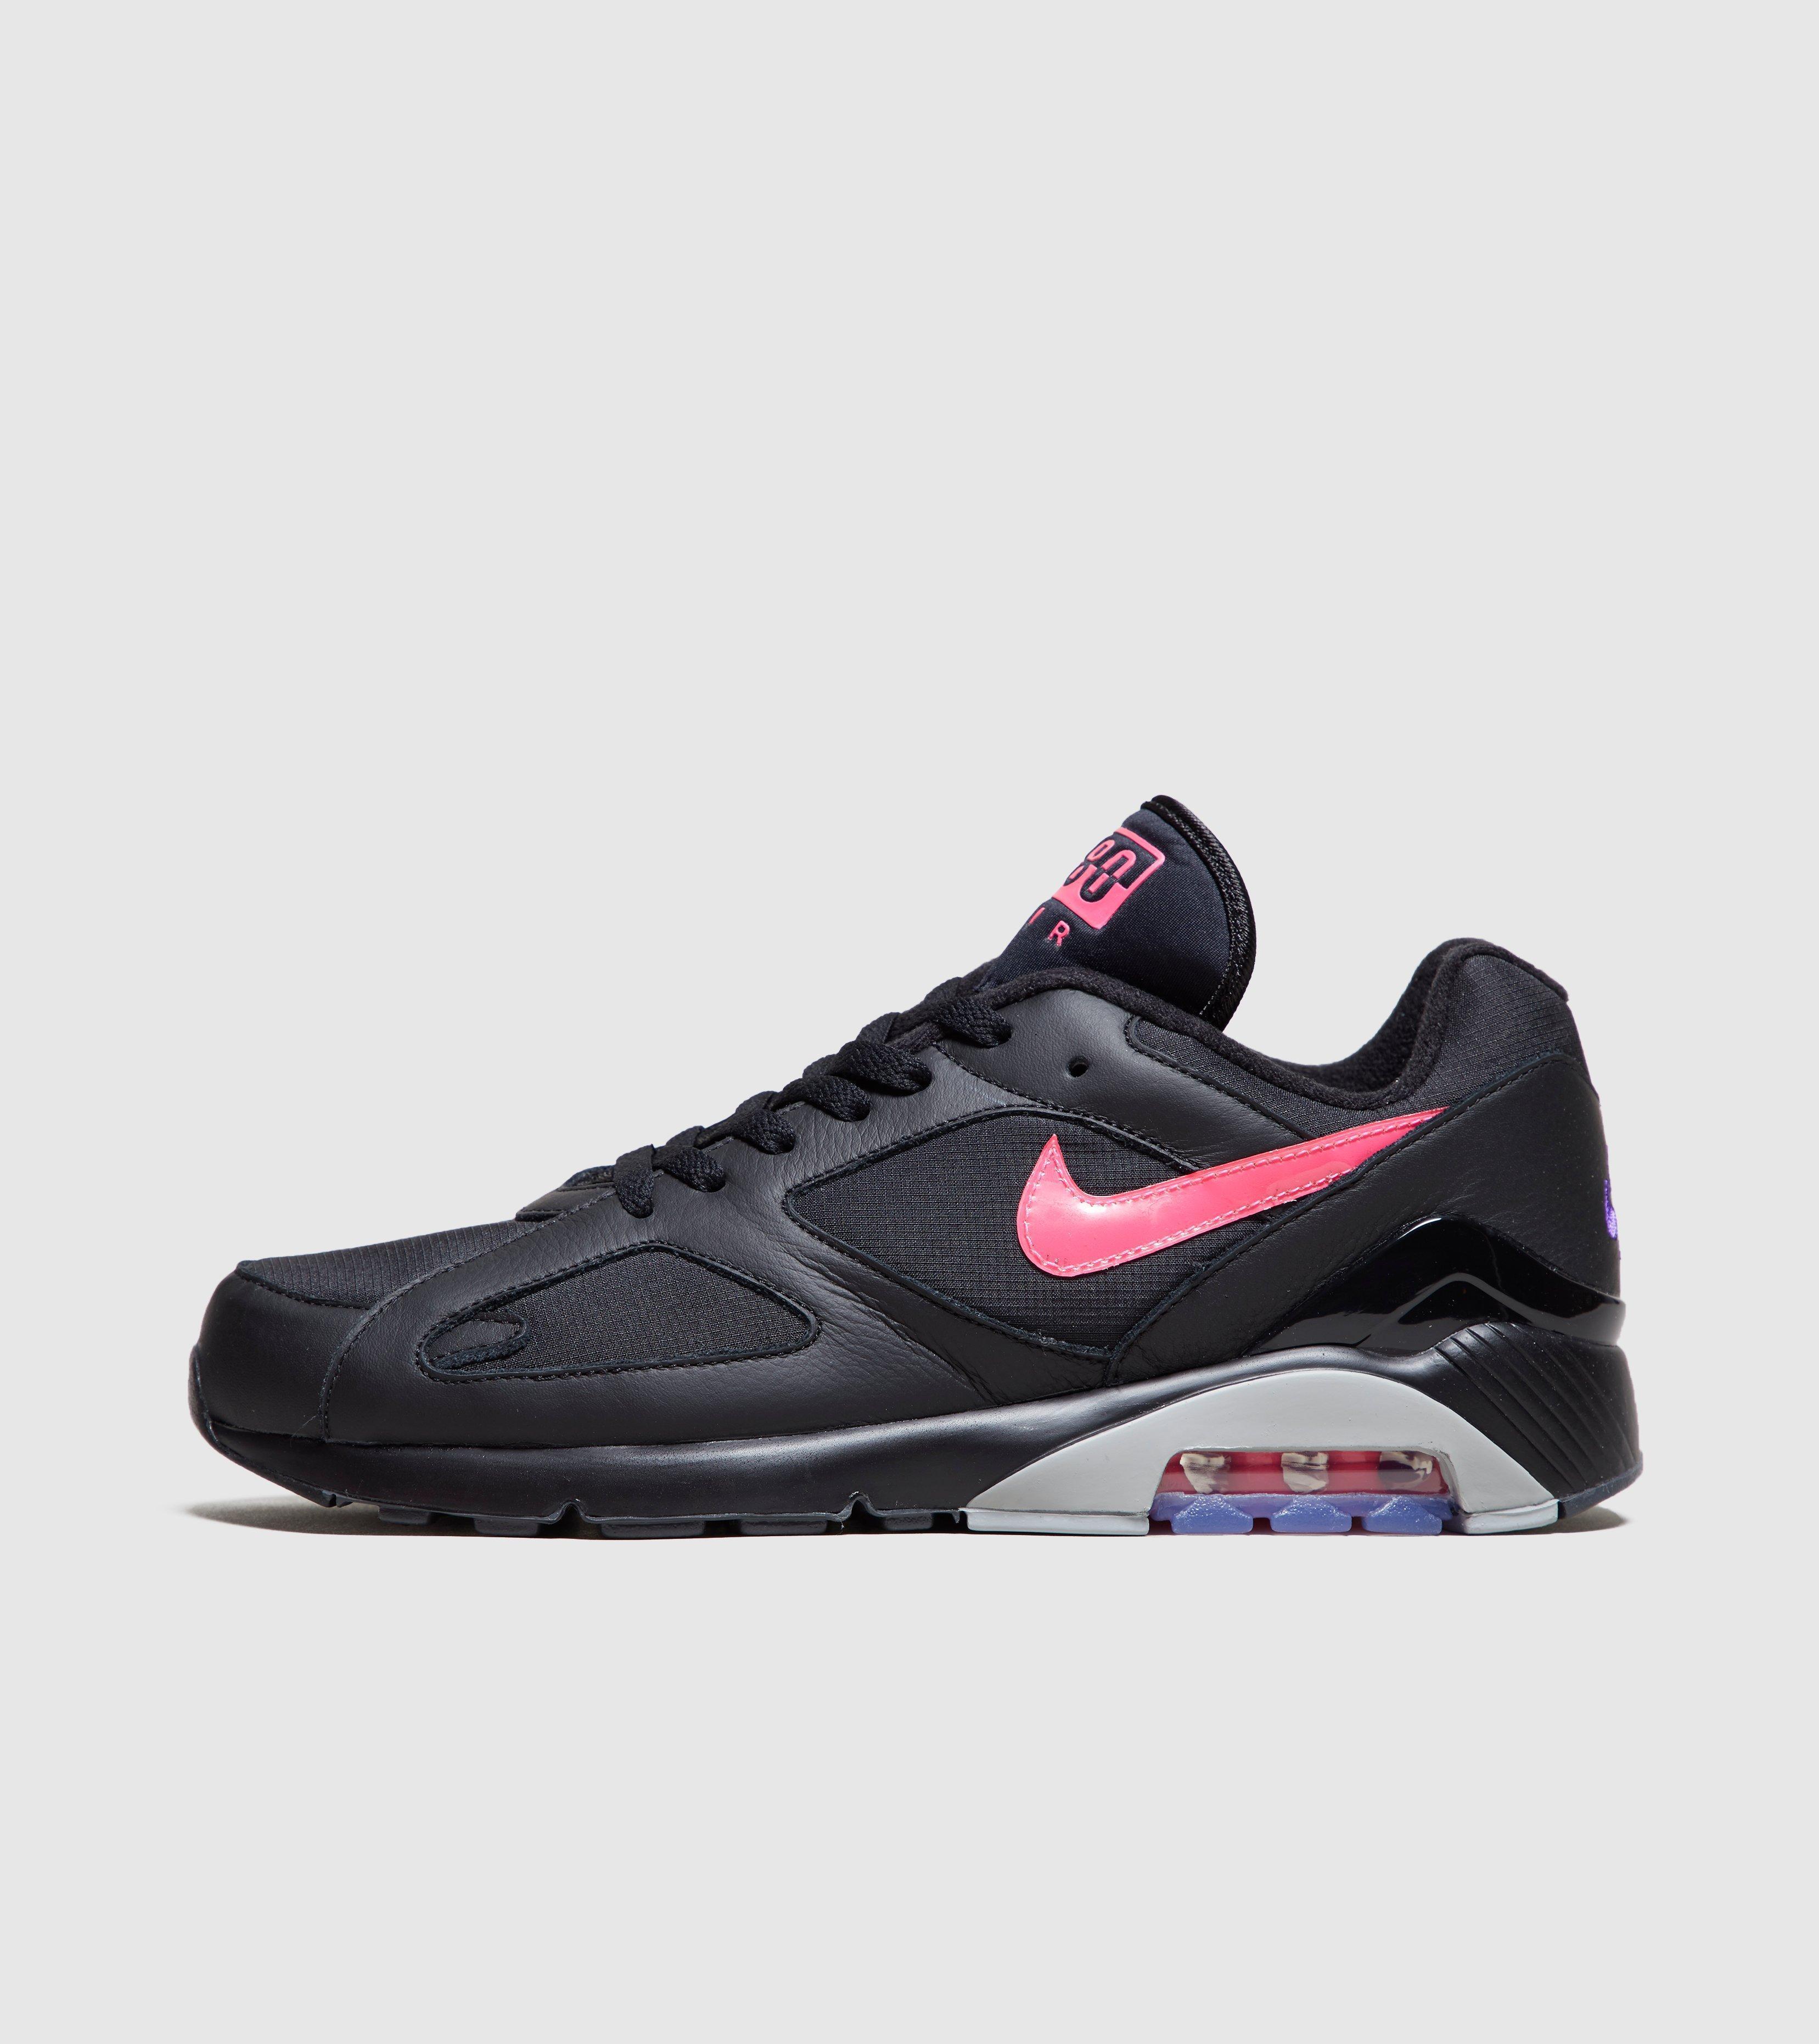 Lyst - Nike Air Max 180 Vaporwave in Black for Men 0f8ca8cf3